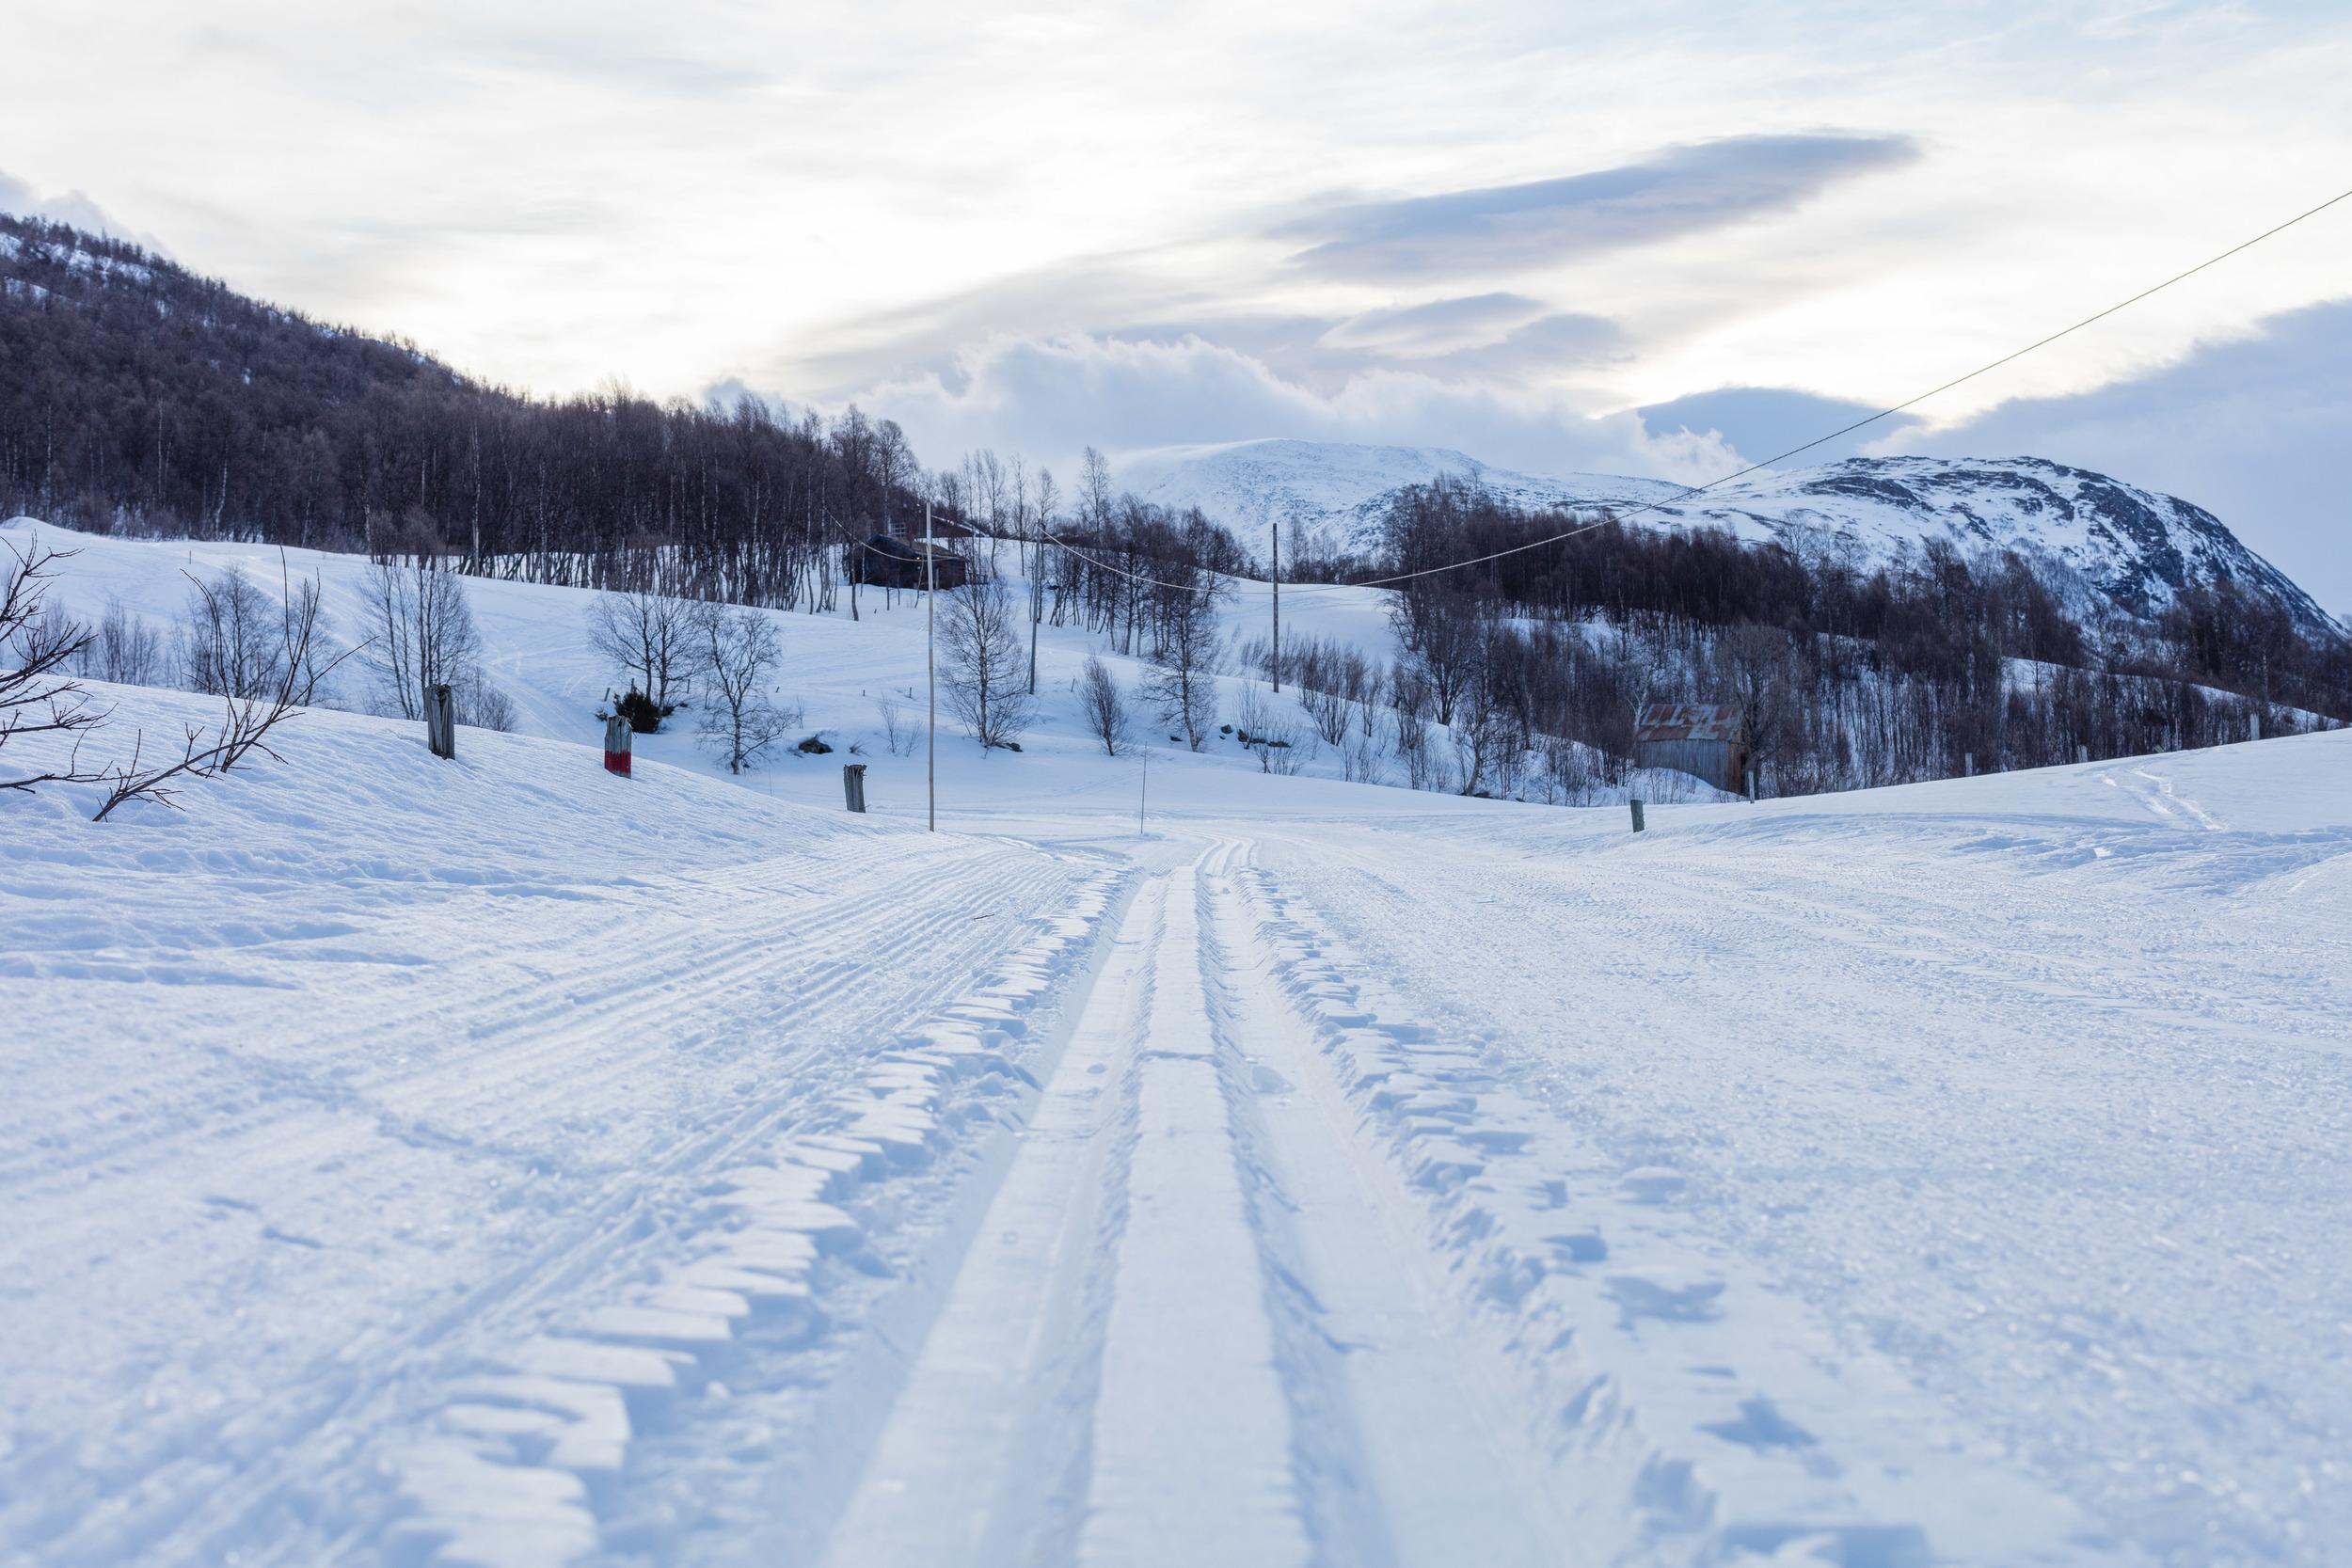 Bortistu-Storlidalen-Oppdal-Norge-Sven-Erik-Knoff-FotoKnoff-69.jpg